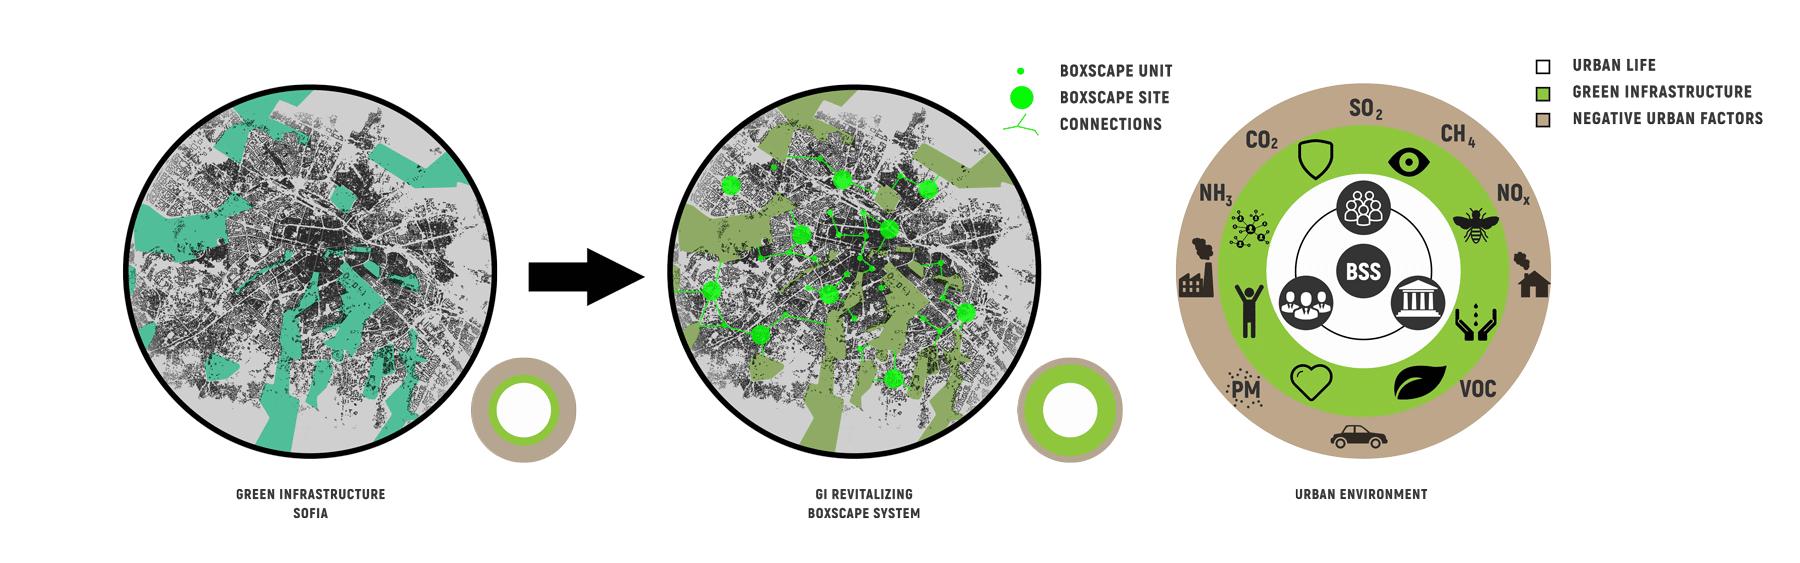 Urban-Environment-B